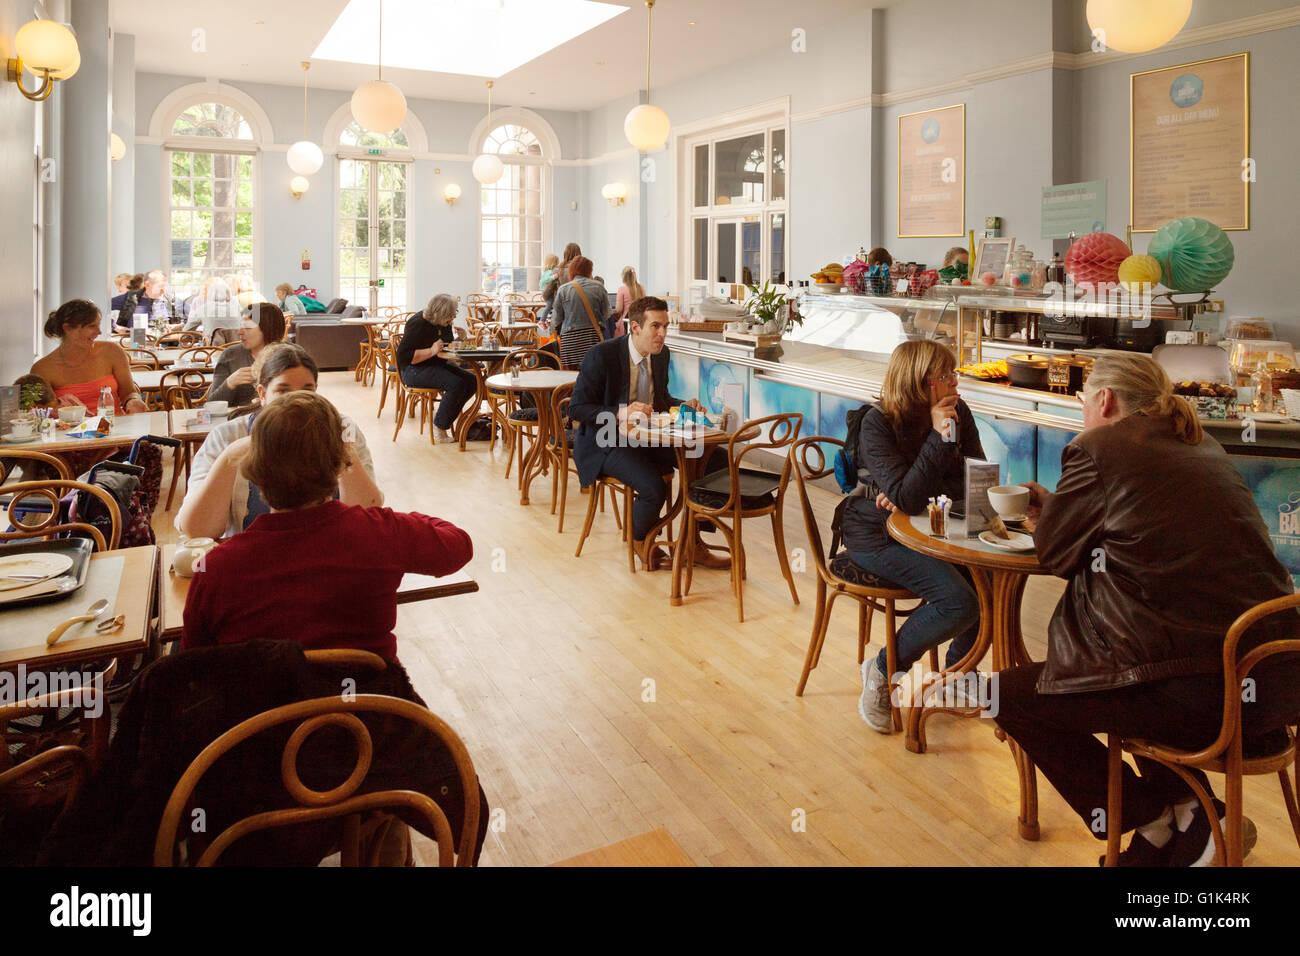 The Pump Room tea room cafe, Pump Rooms, Royal Leamington Spa, Warwickshire UK - Stock Image